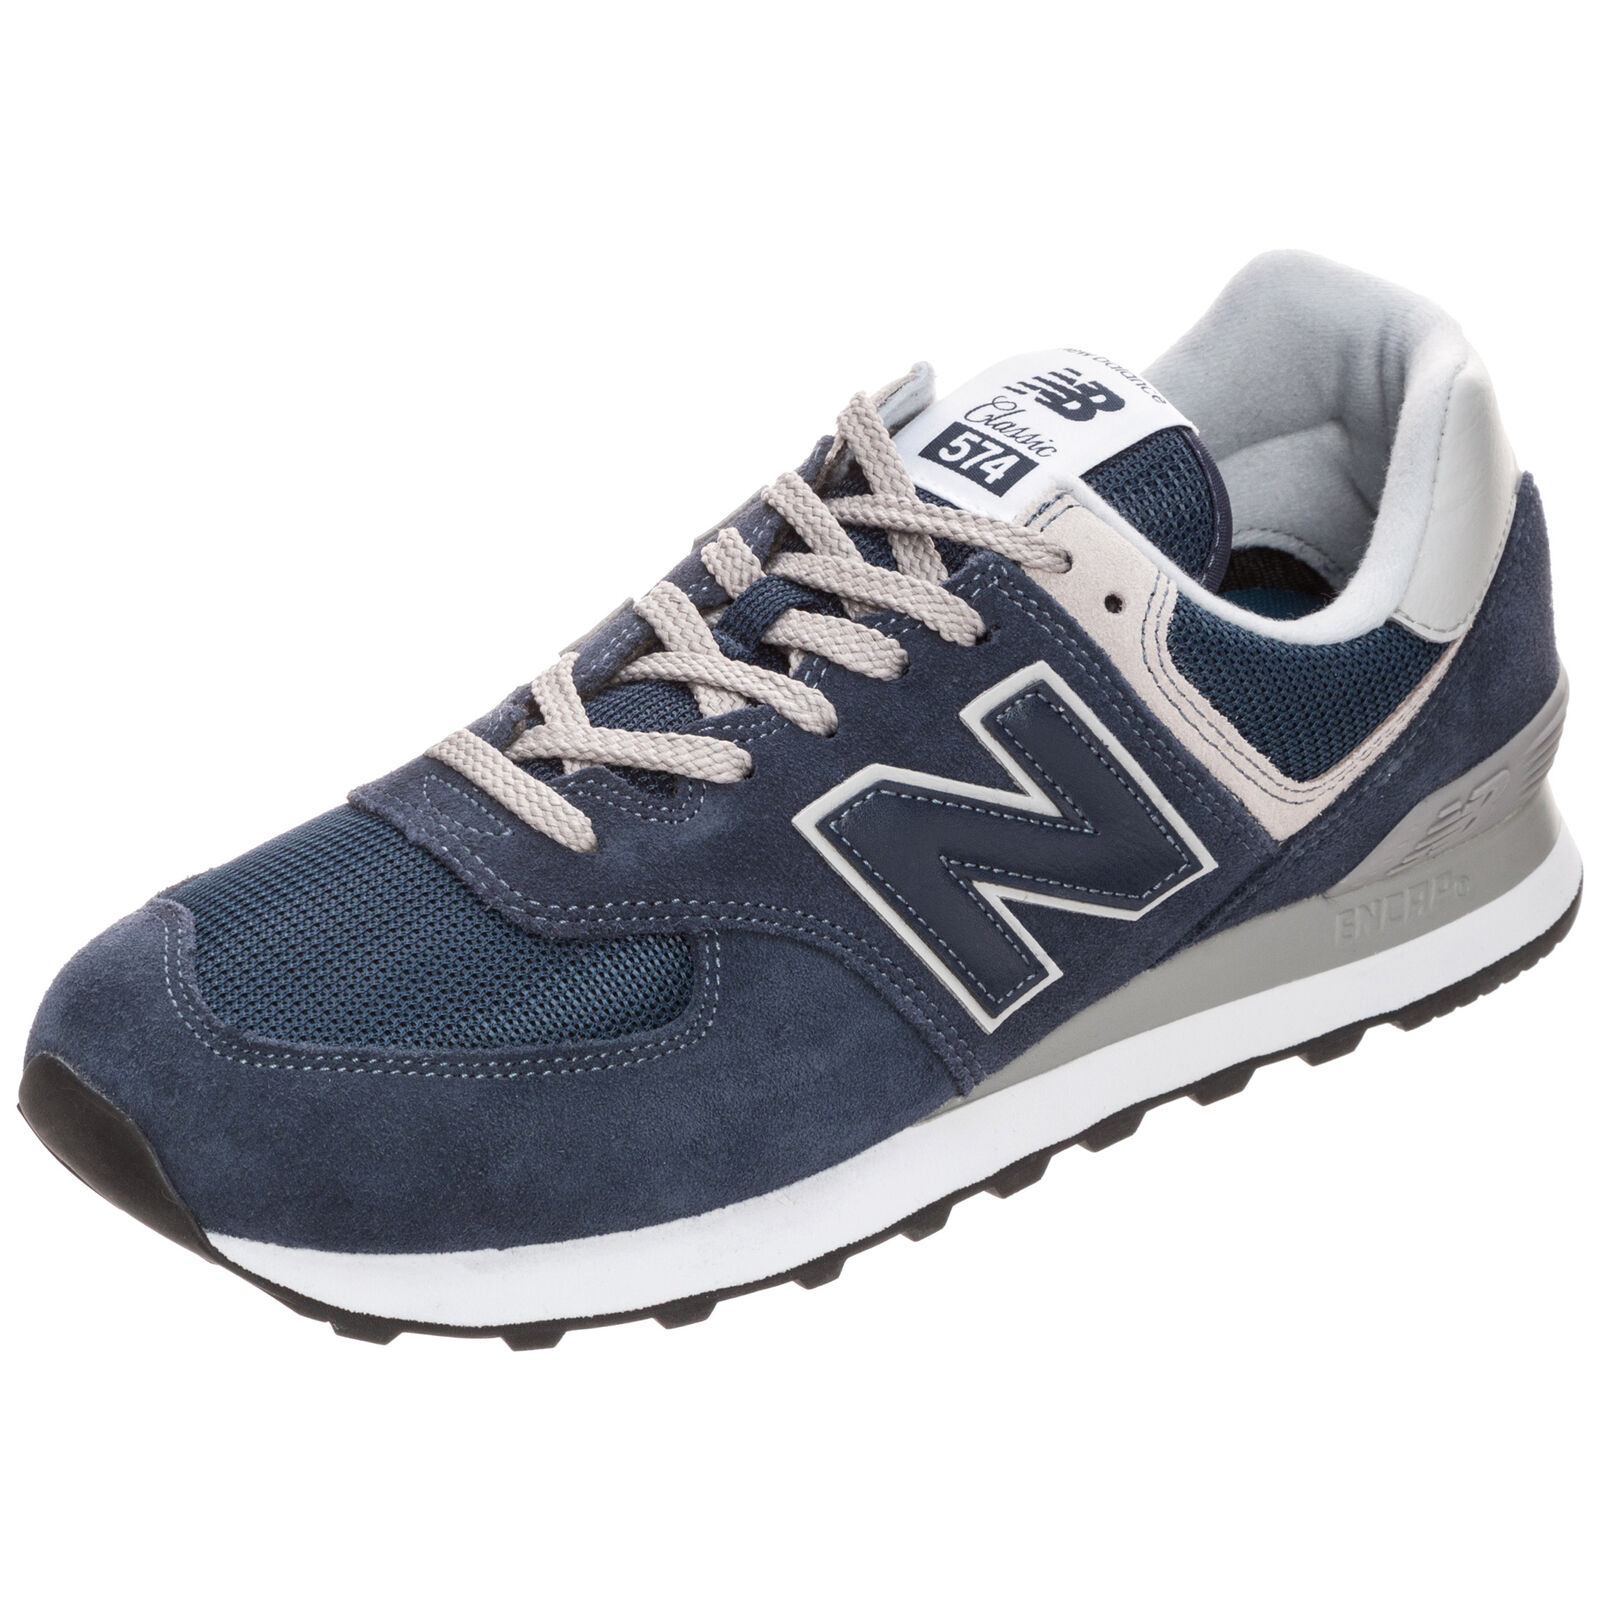 New Balance ML574-EGN-D Sneaker Blau NEU Schuhe Turnschuhe